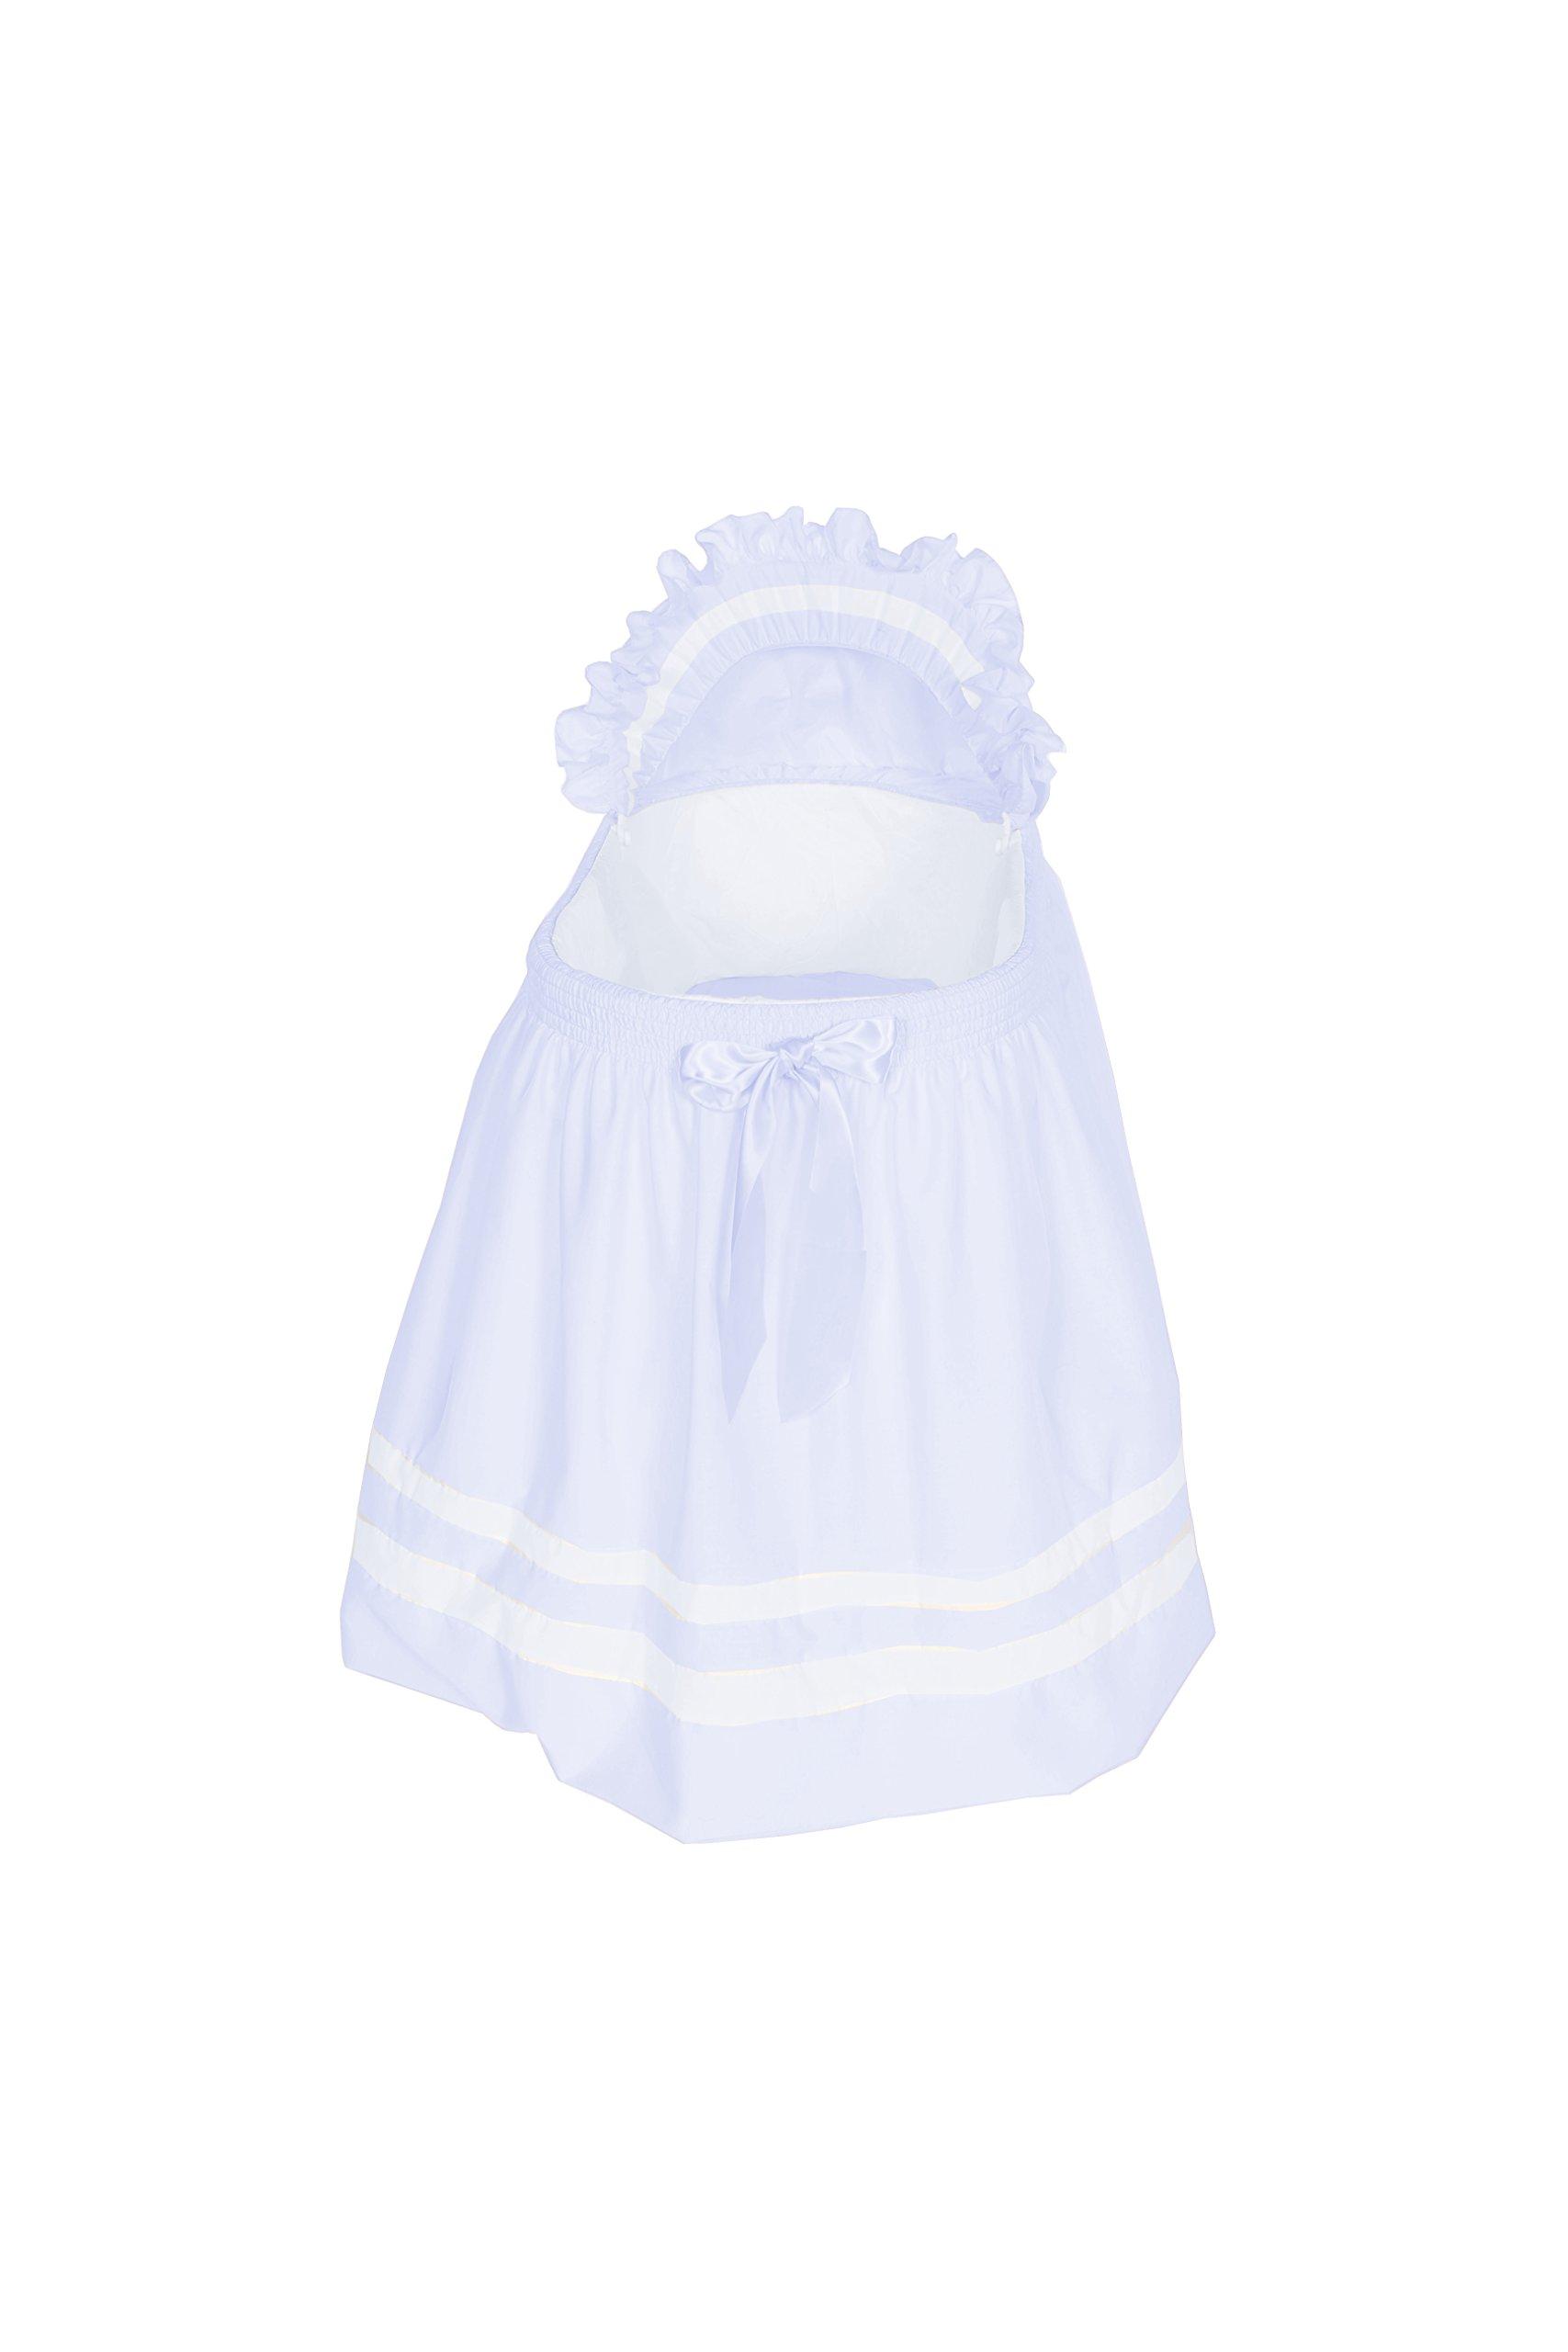 Baby Doll Bedding Modern Hotel Style Bassinet Liner, Blue